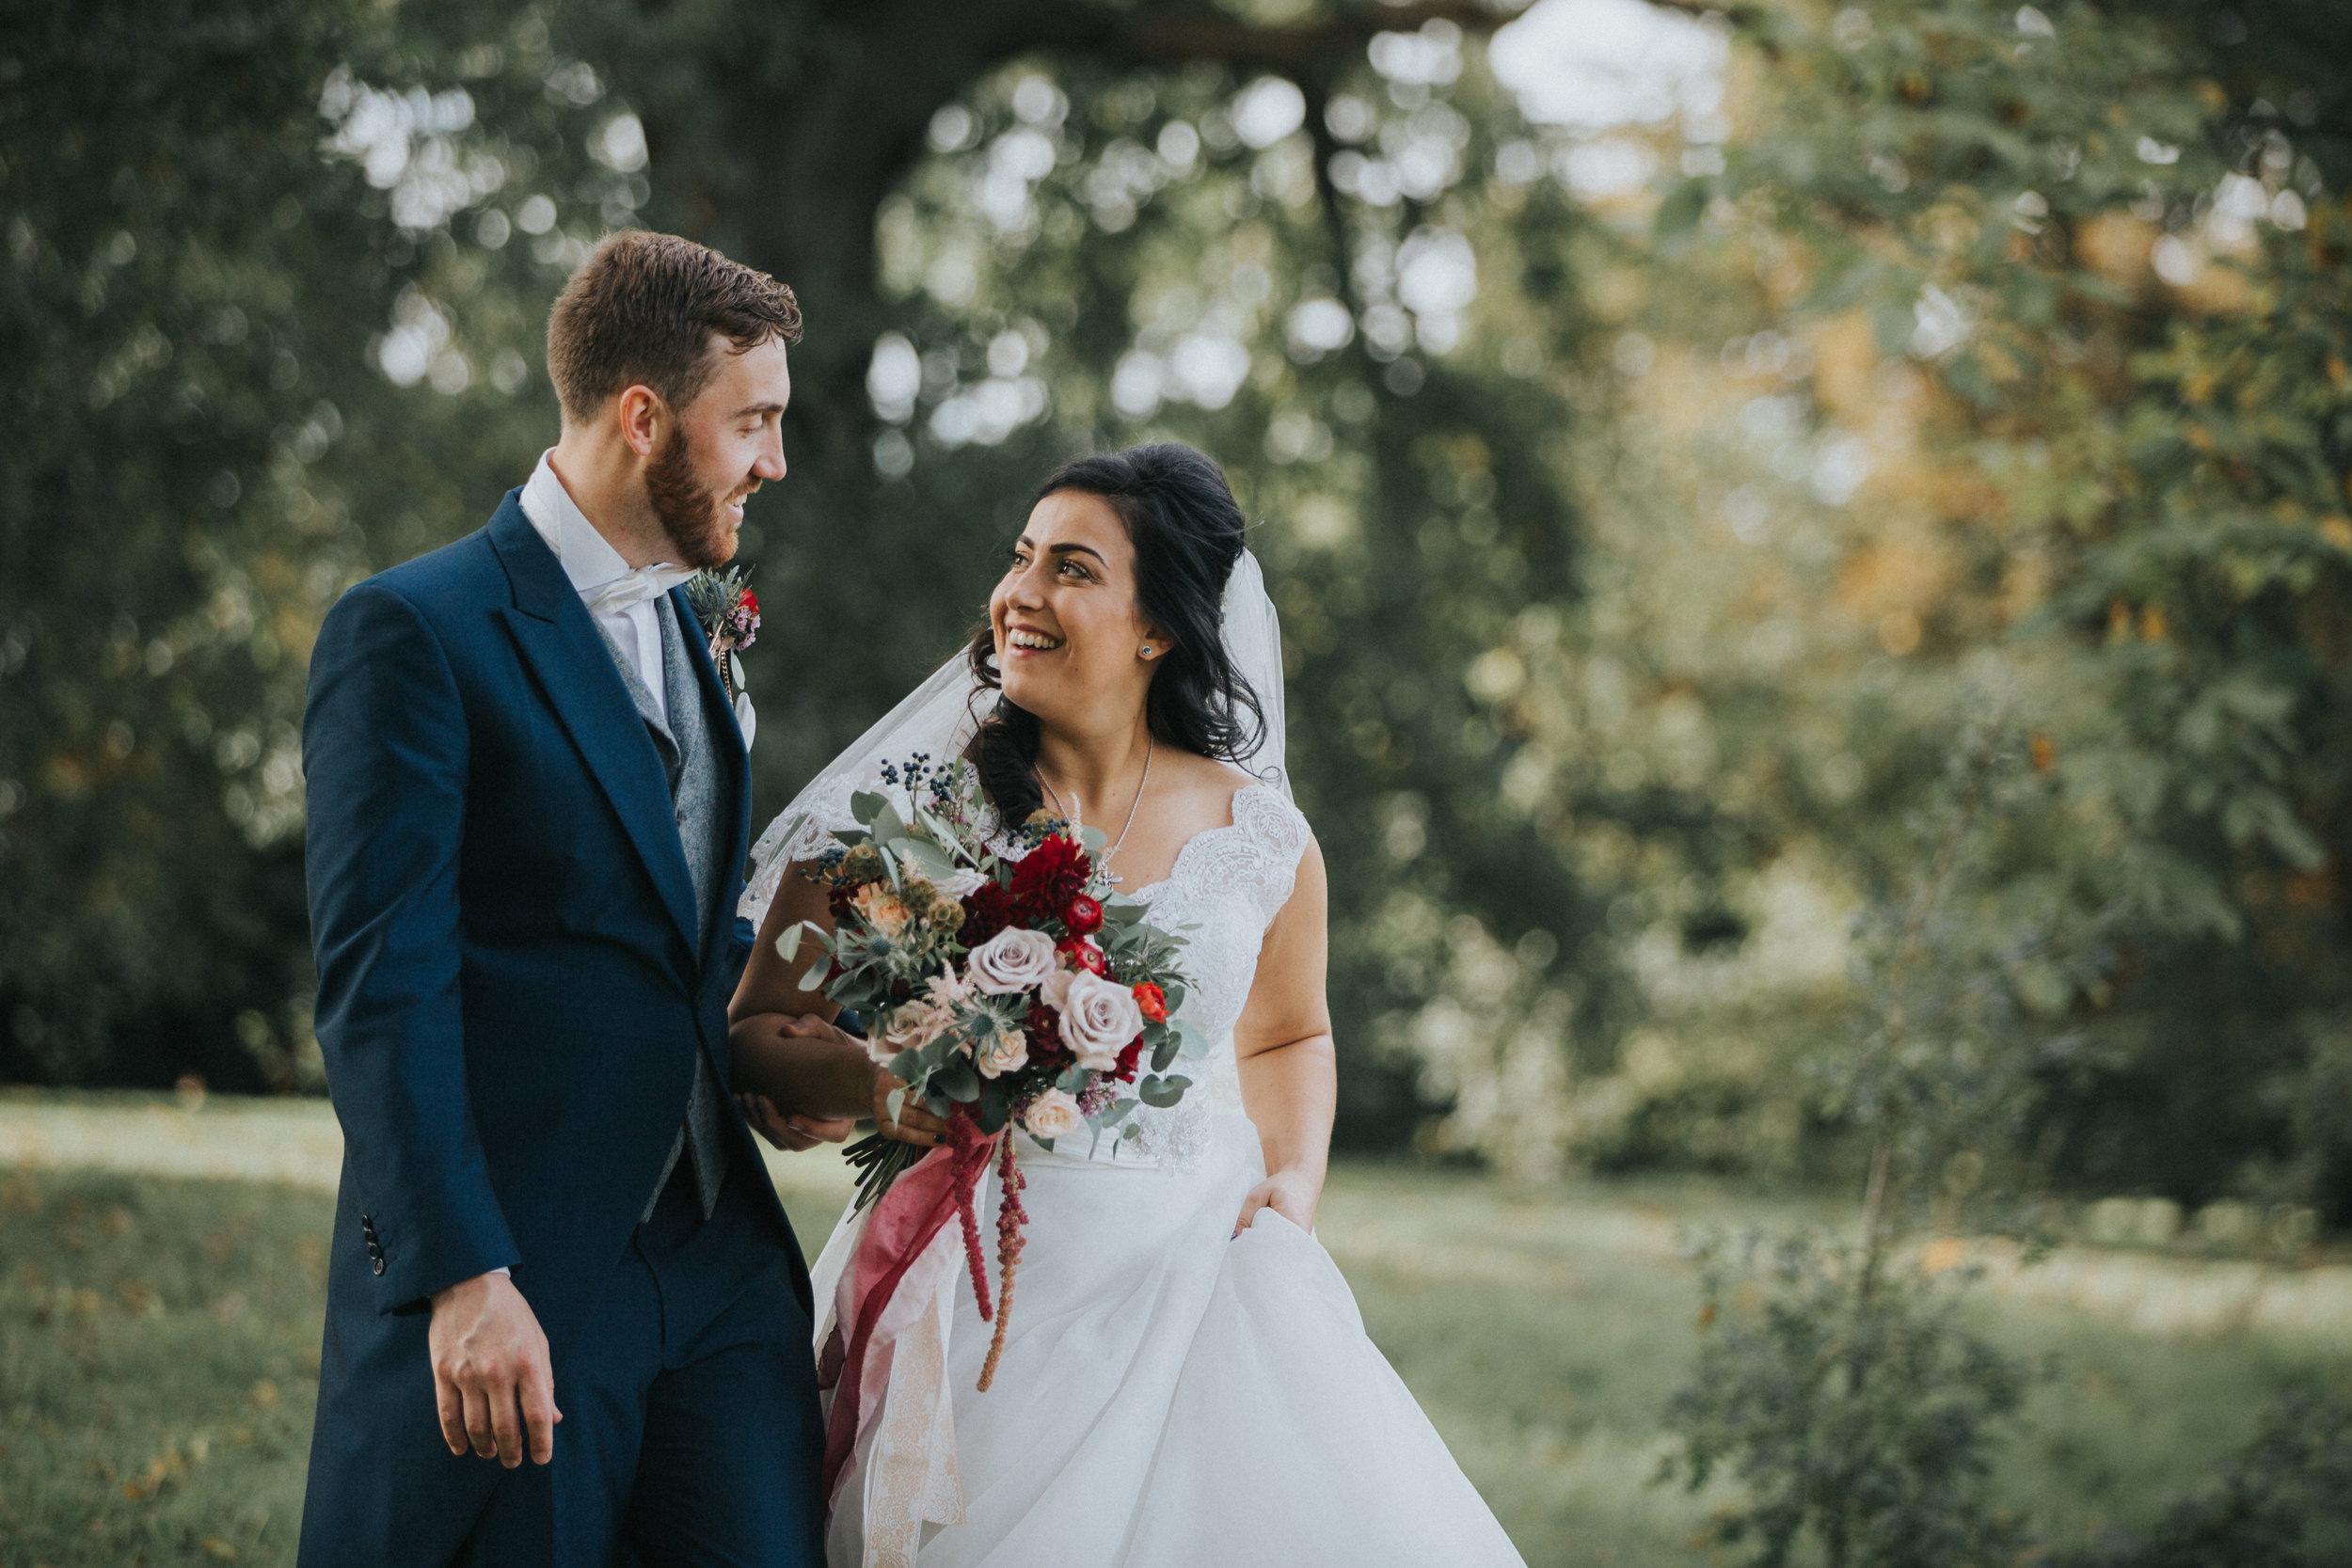 london-bedfordshire-uk-wedding-photography-woburn-sculpture-gallery-bridal-portrait-51